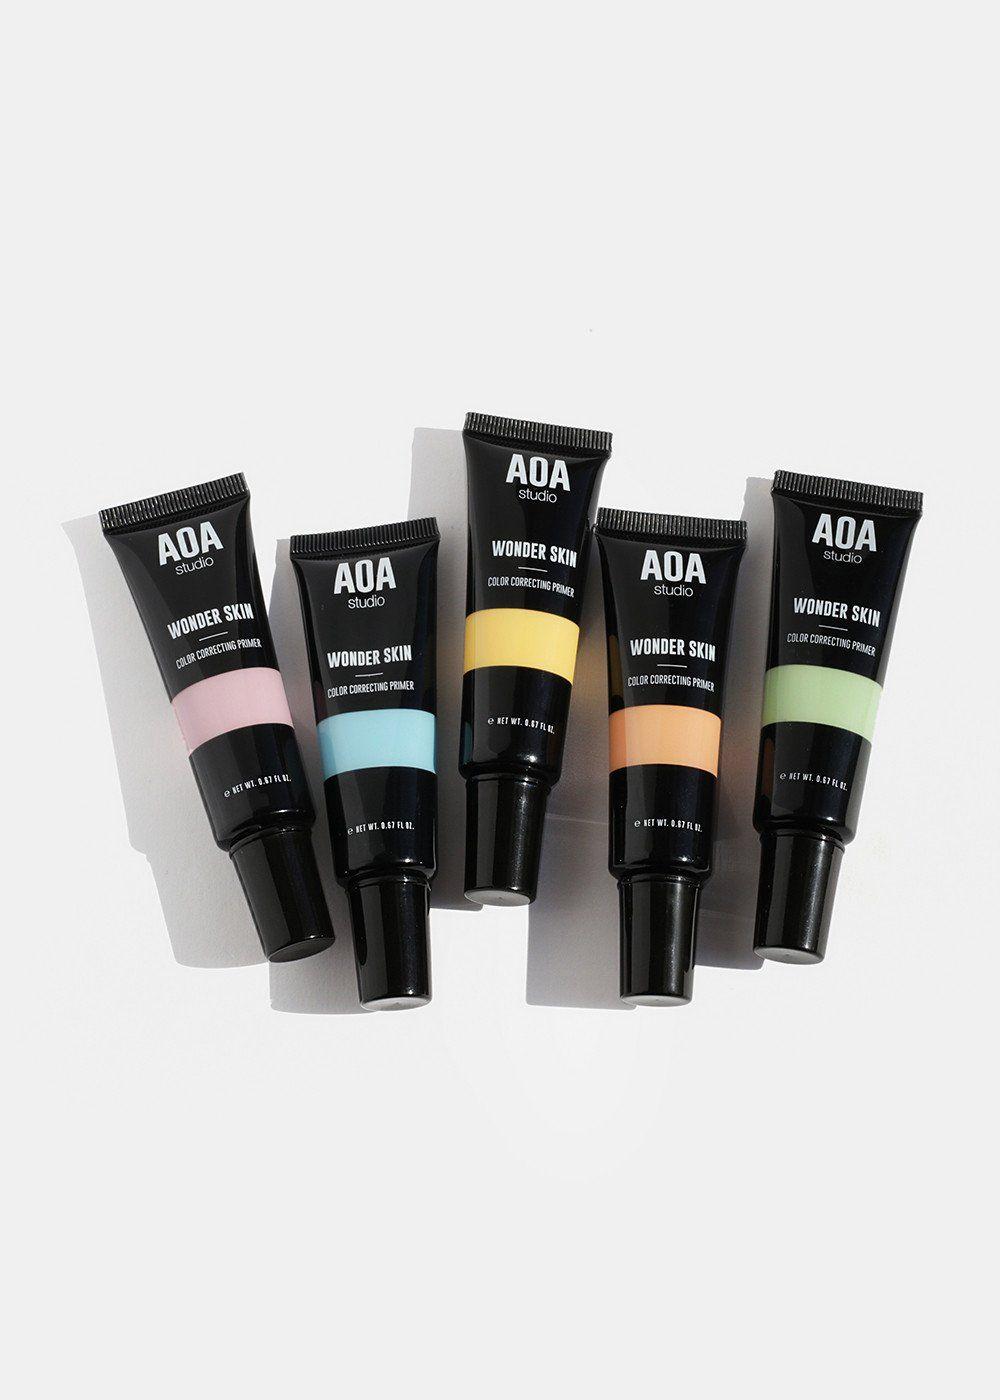 Wonder Skin - Perfecting Blur Primer by AOA Studio #15